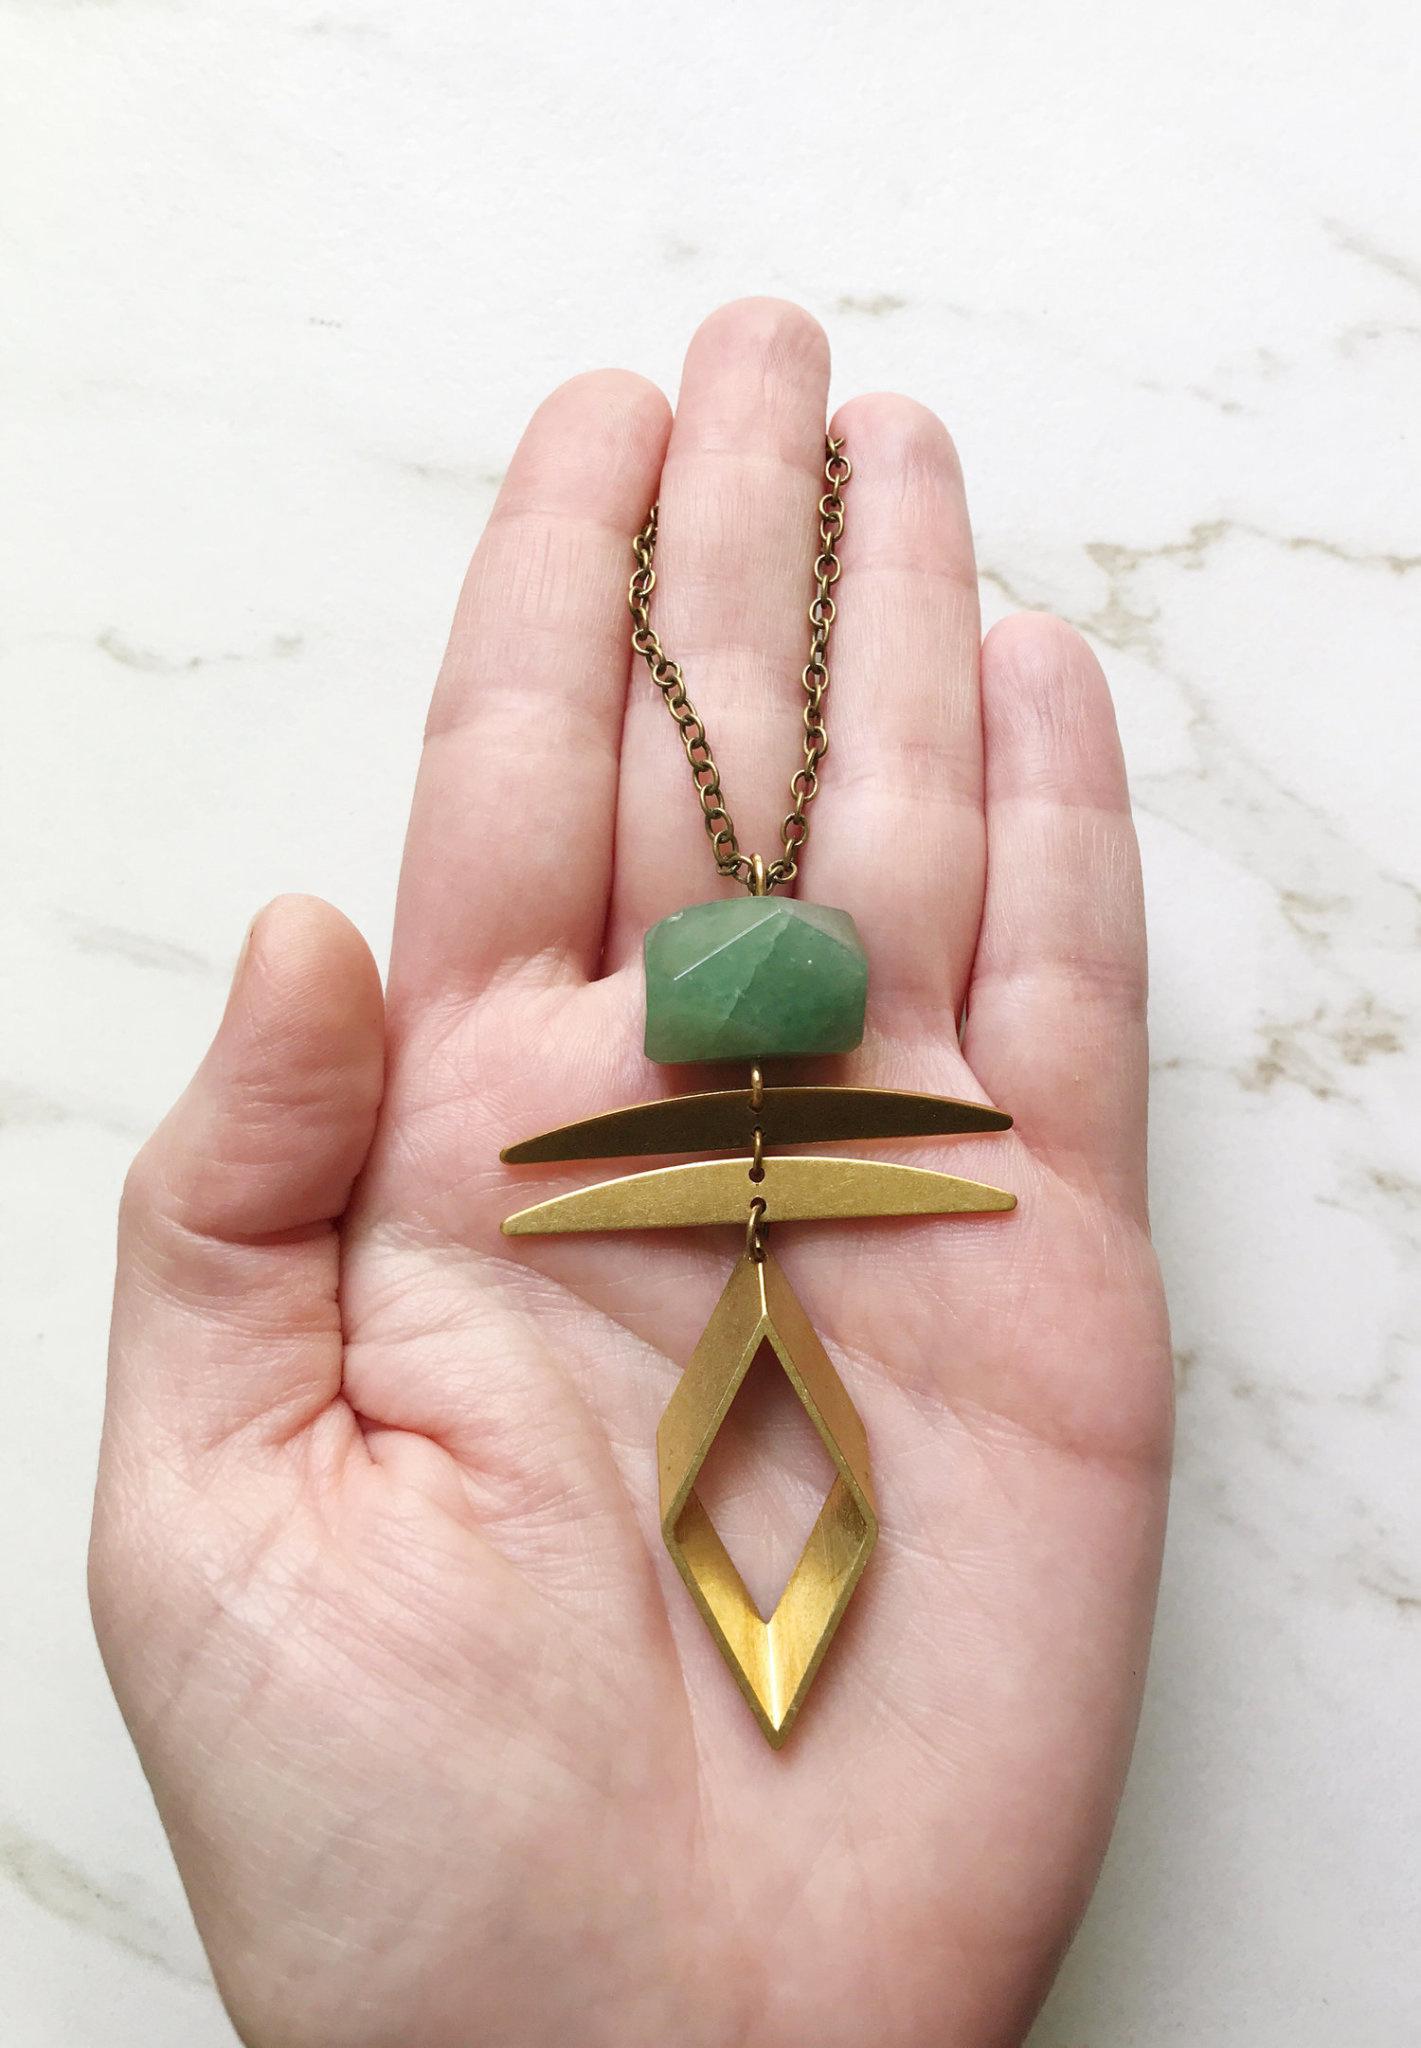 Aventurine Rhombus Necklace